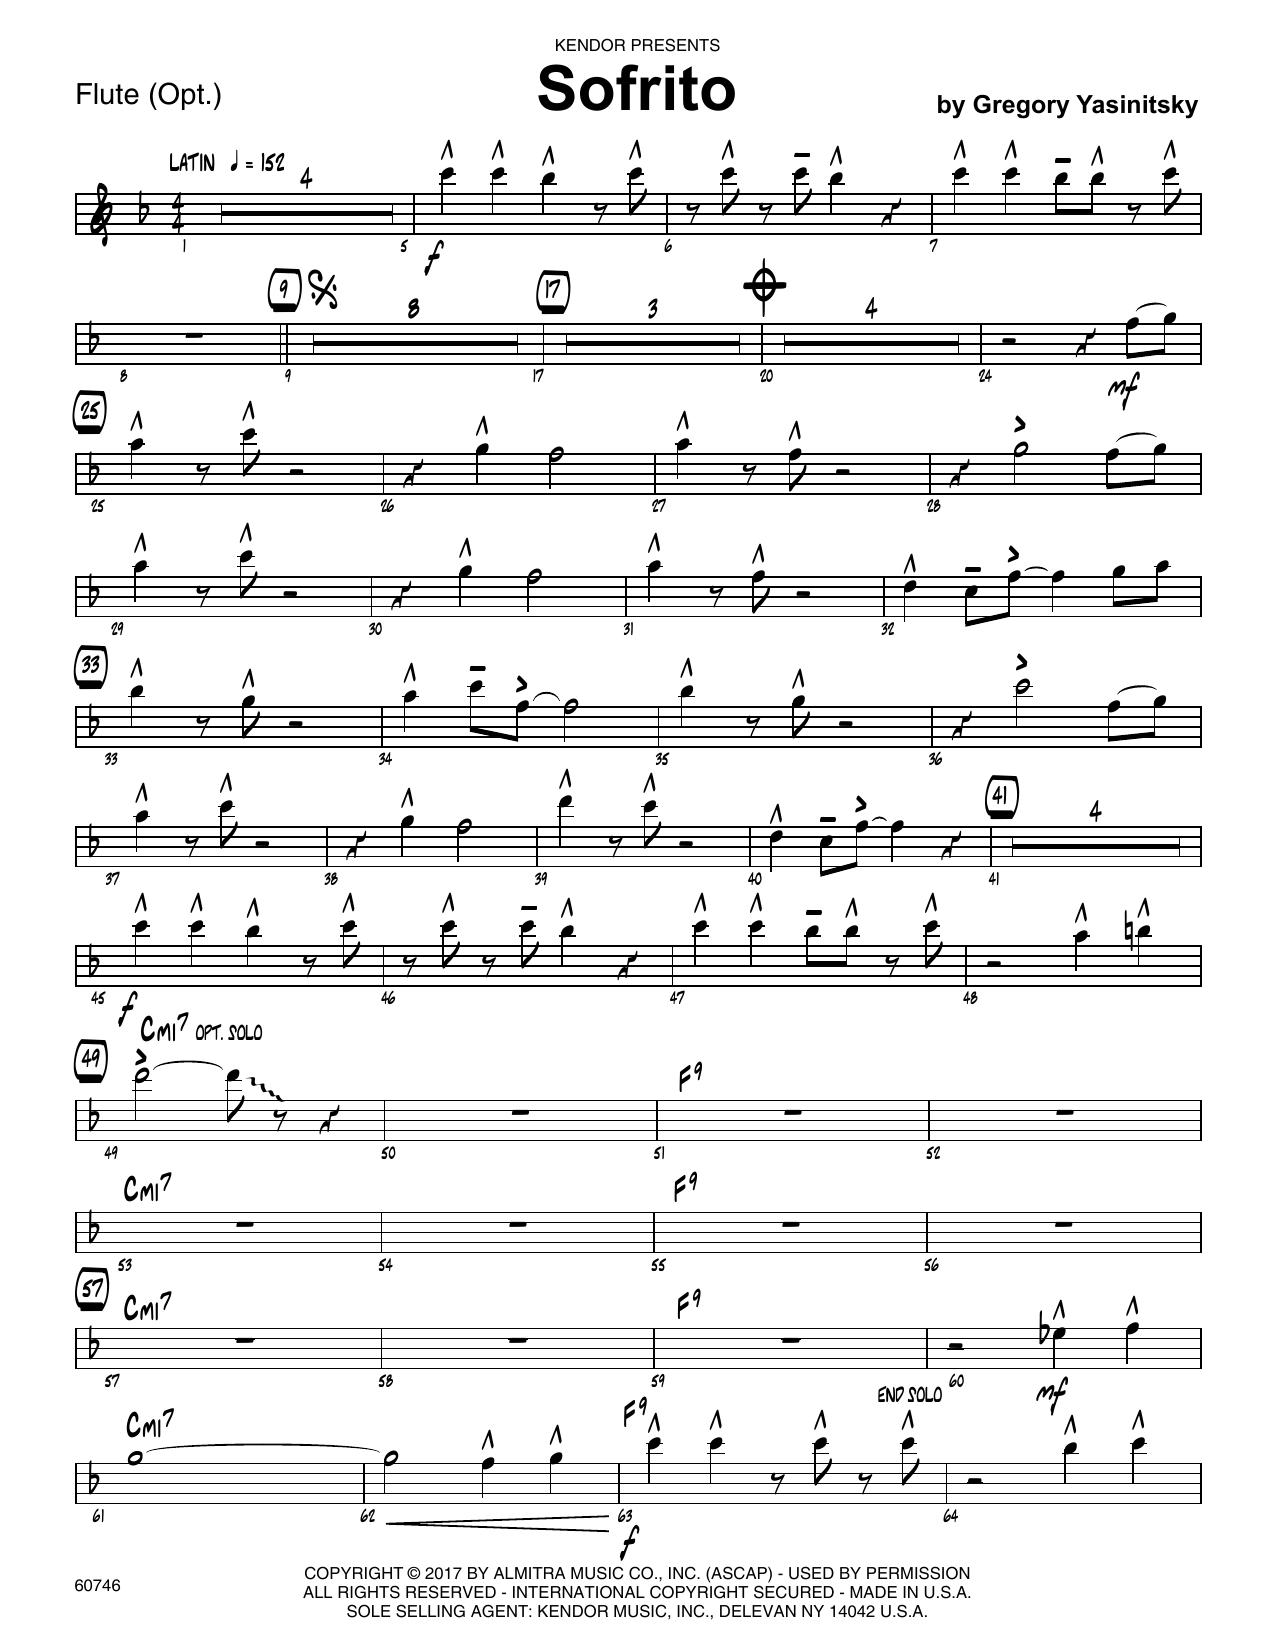 Sofrito - Flute Sheet Music